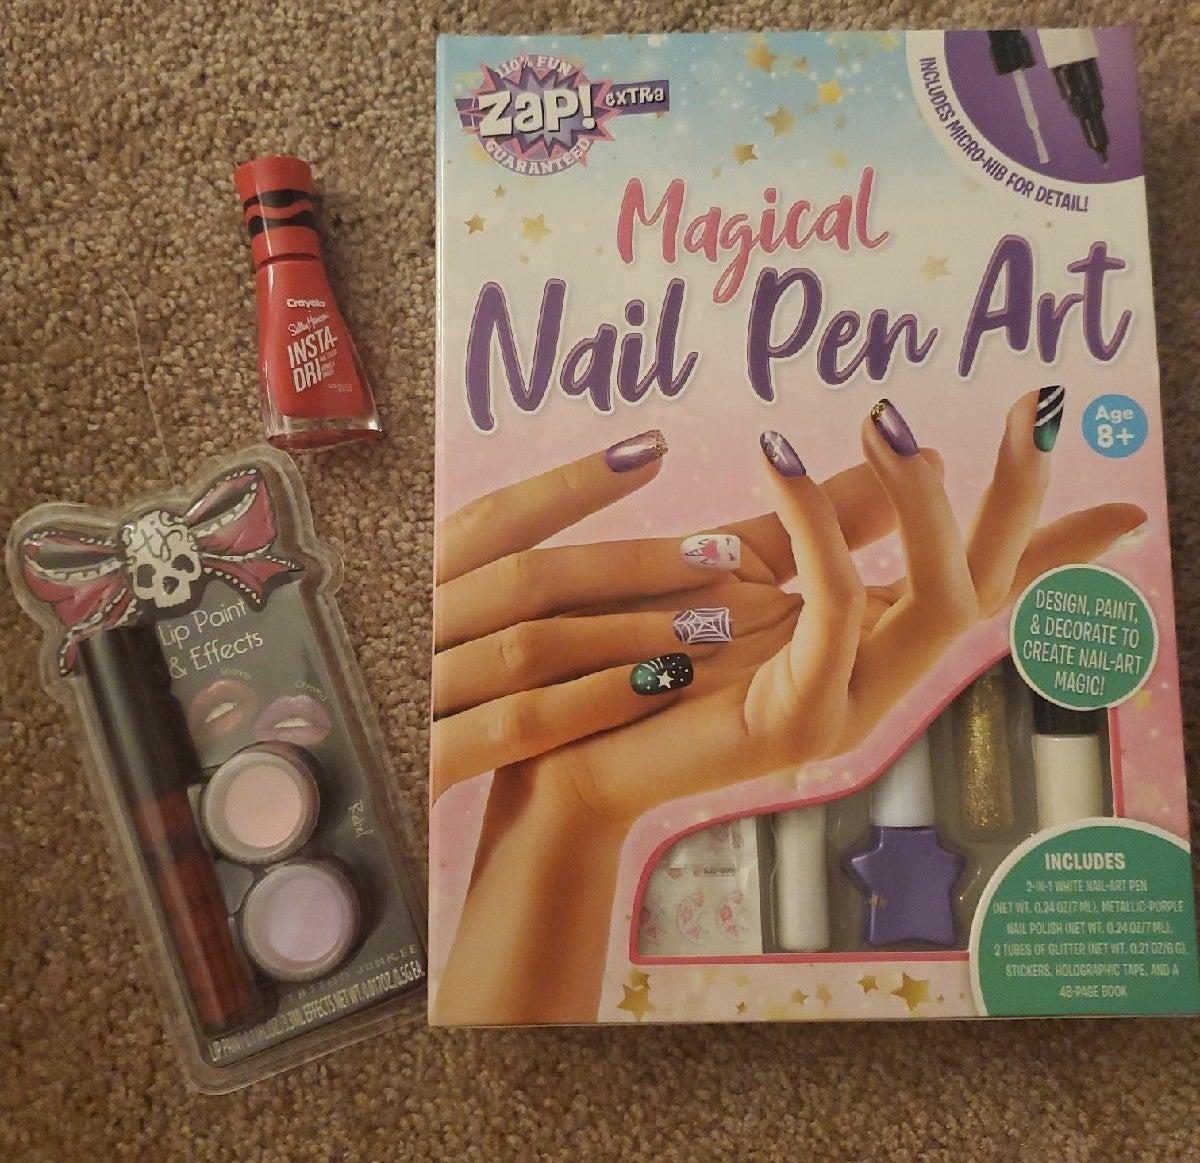 Zap! Magical Nail Pen Art & More Ages 8+